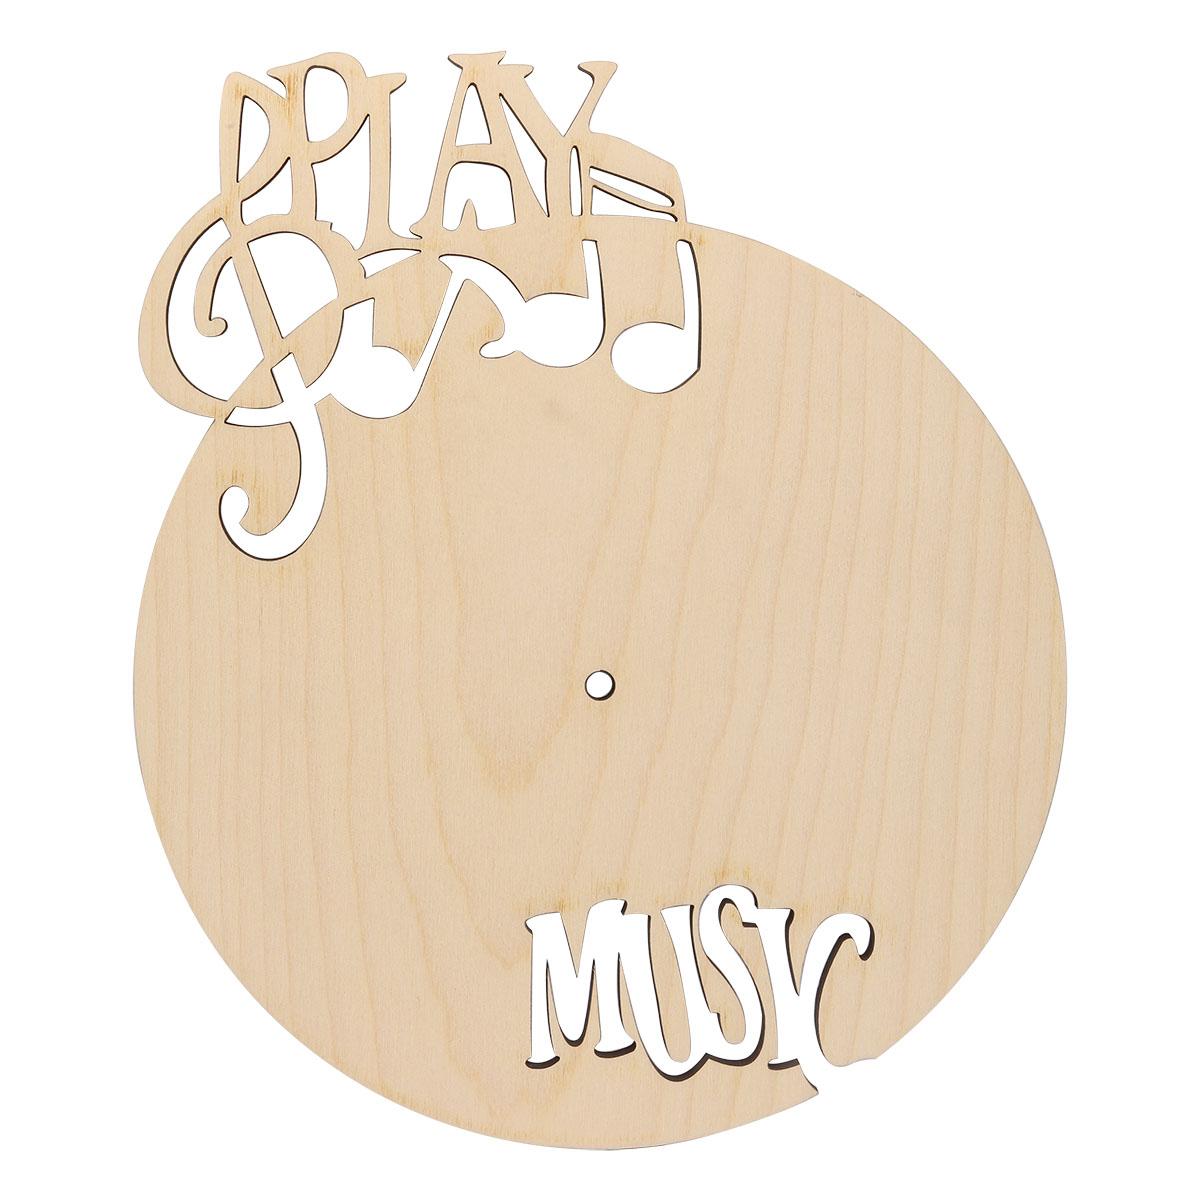 L-337 Деревянная заготовка циферблат 'Play music', 30*24 см, 'Астра'